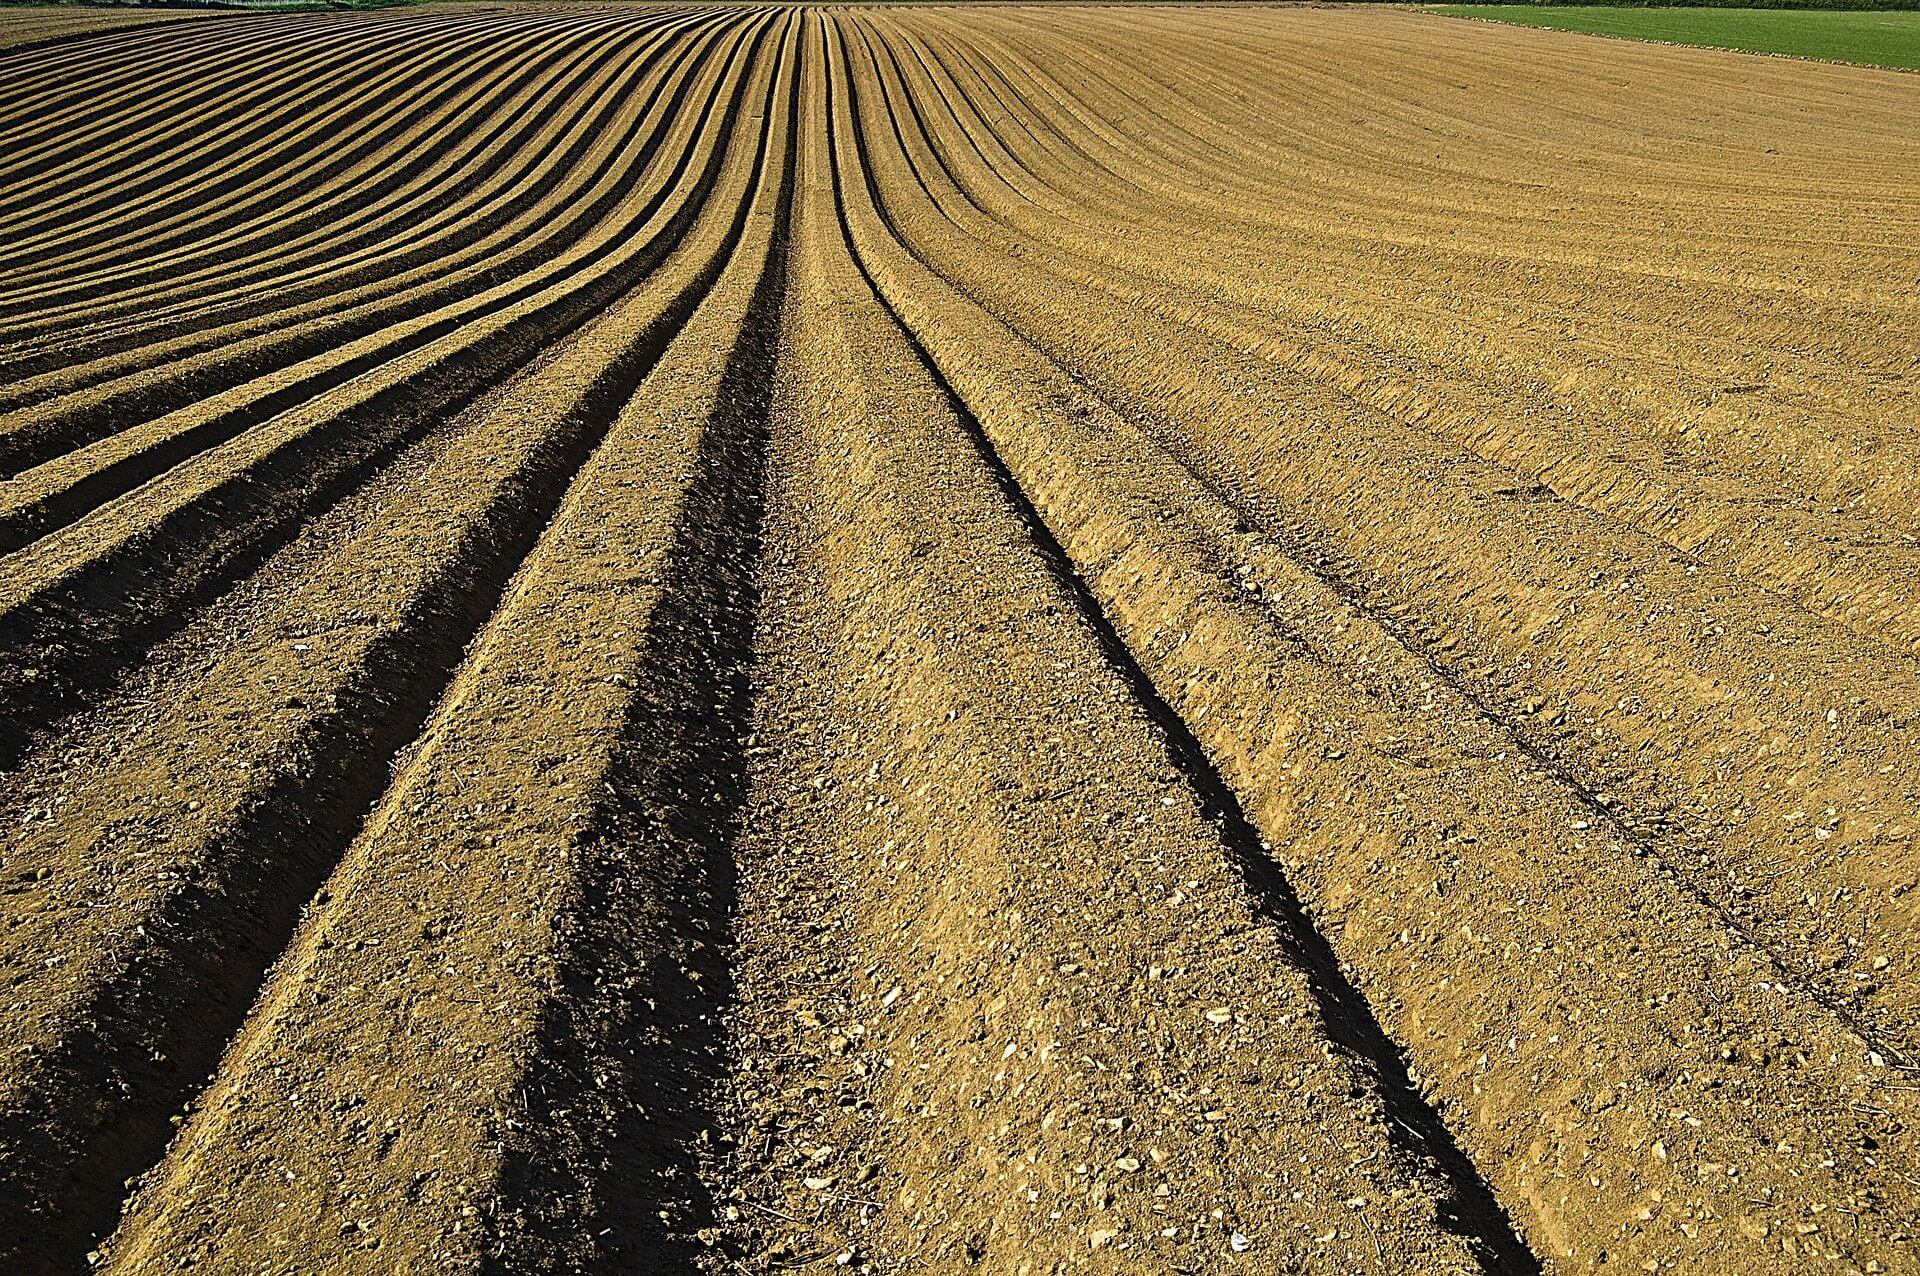 A row of tilled soil.